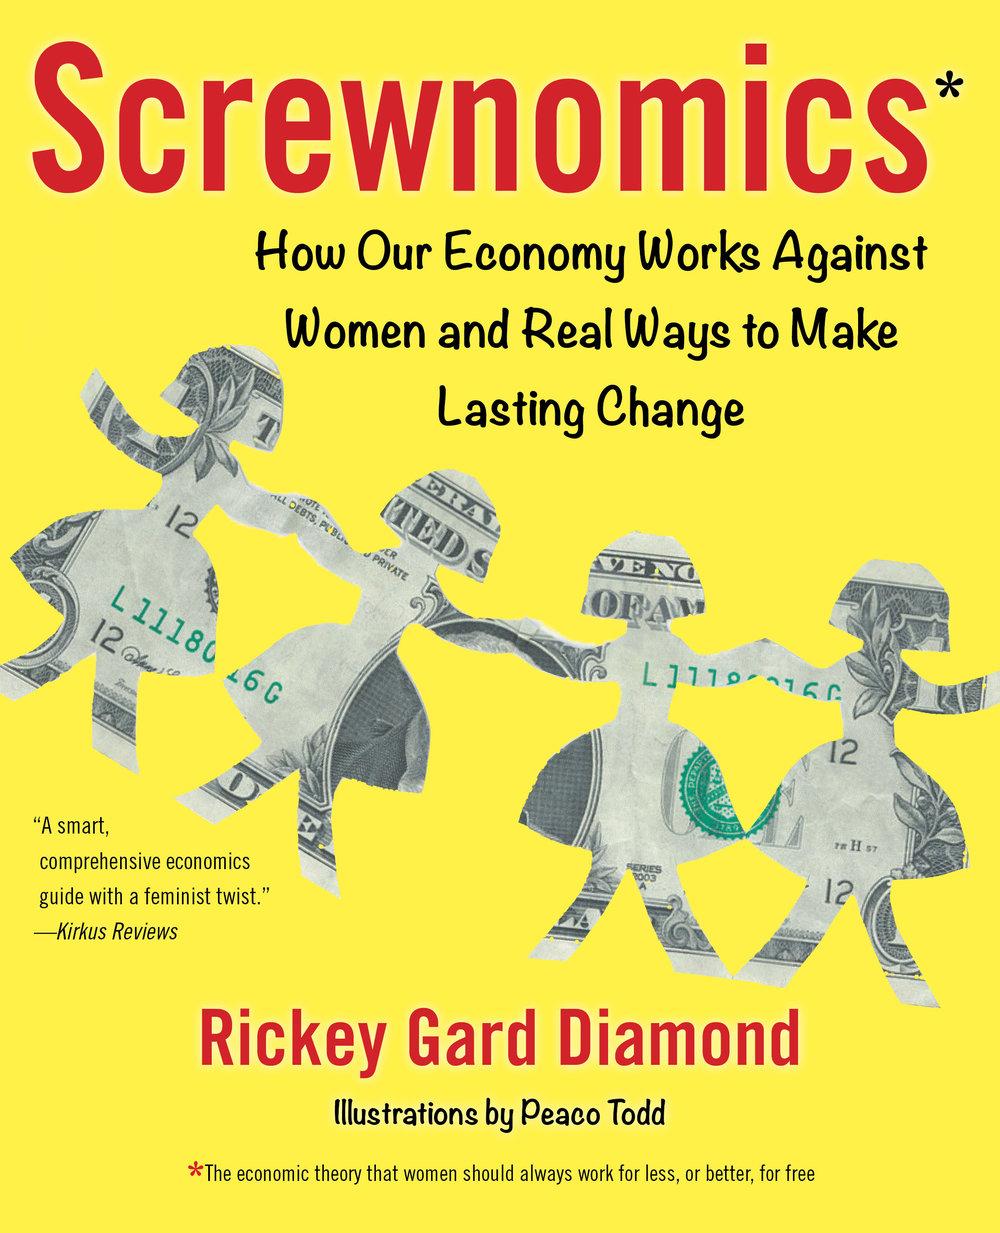 Screwnomics Cover 2.11.18.jpeg